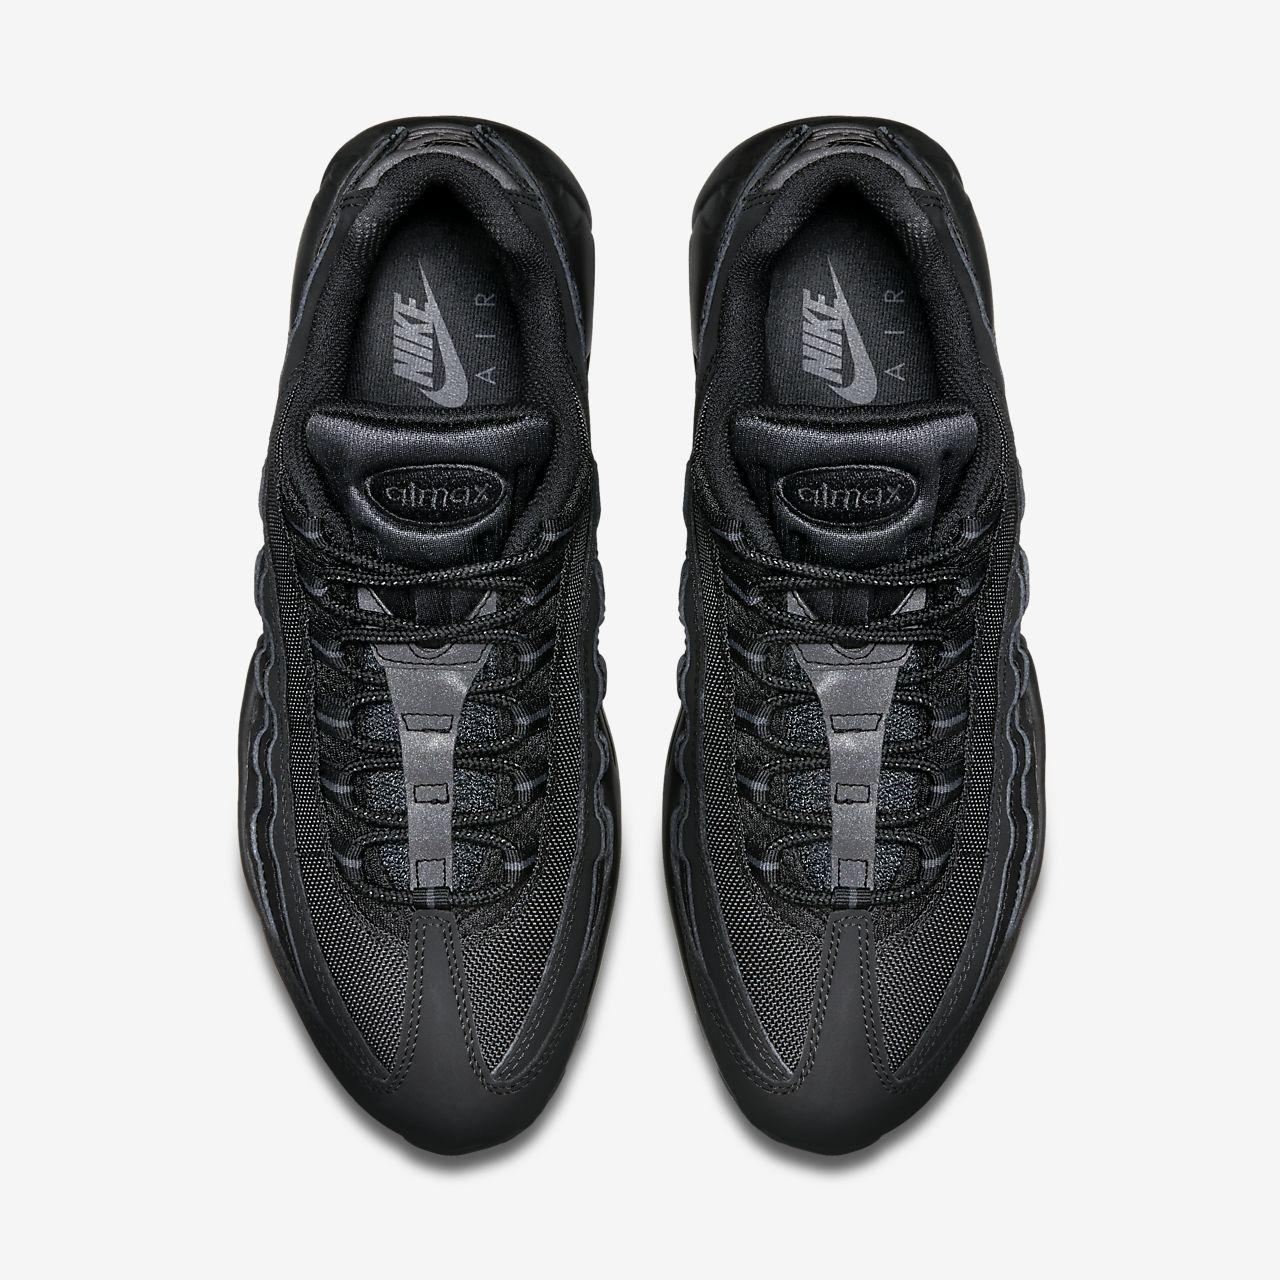 chaussure enfant garcon nike pointure 38